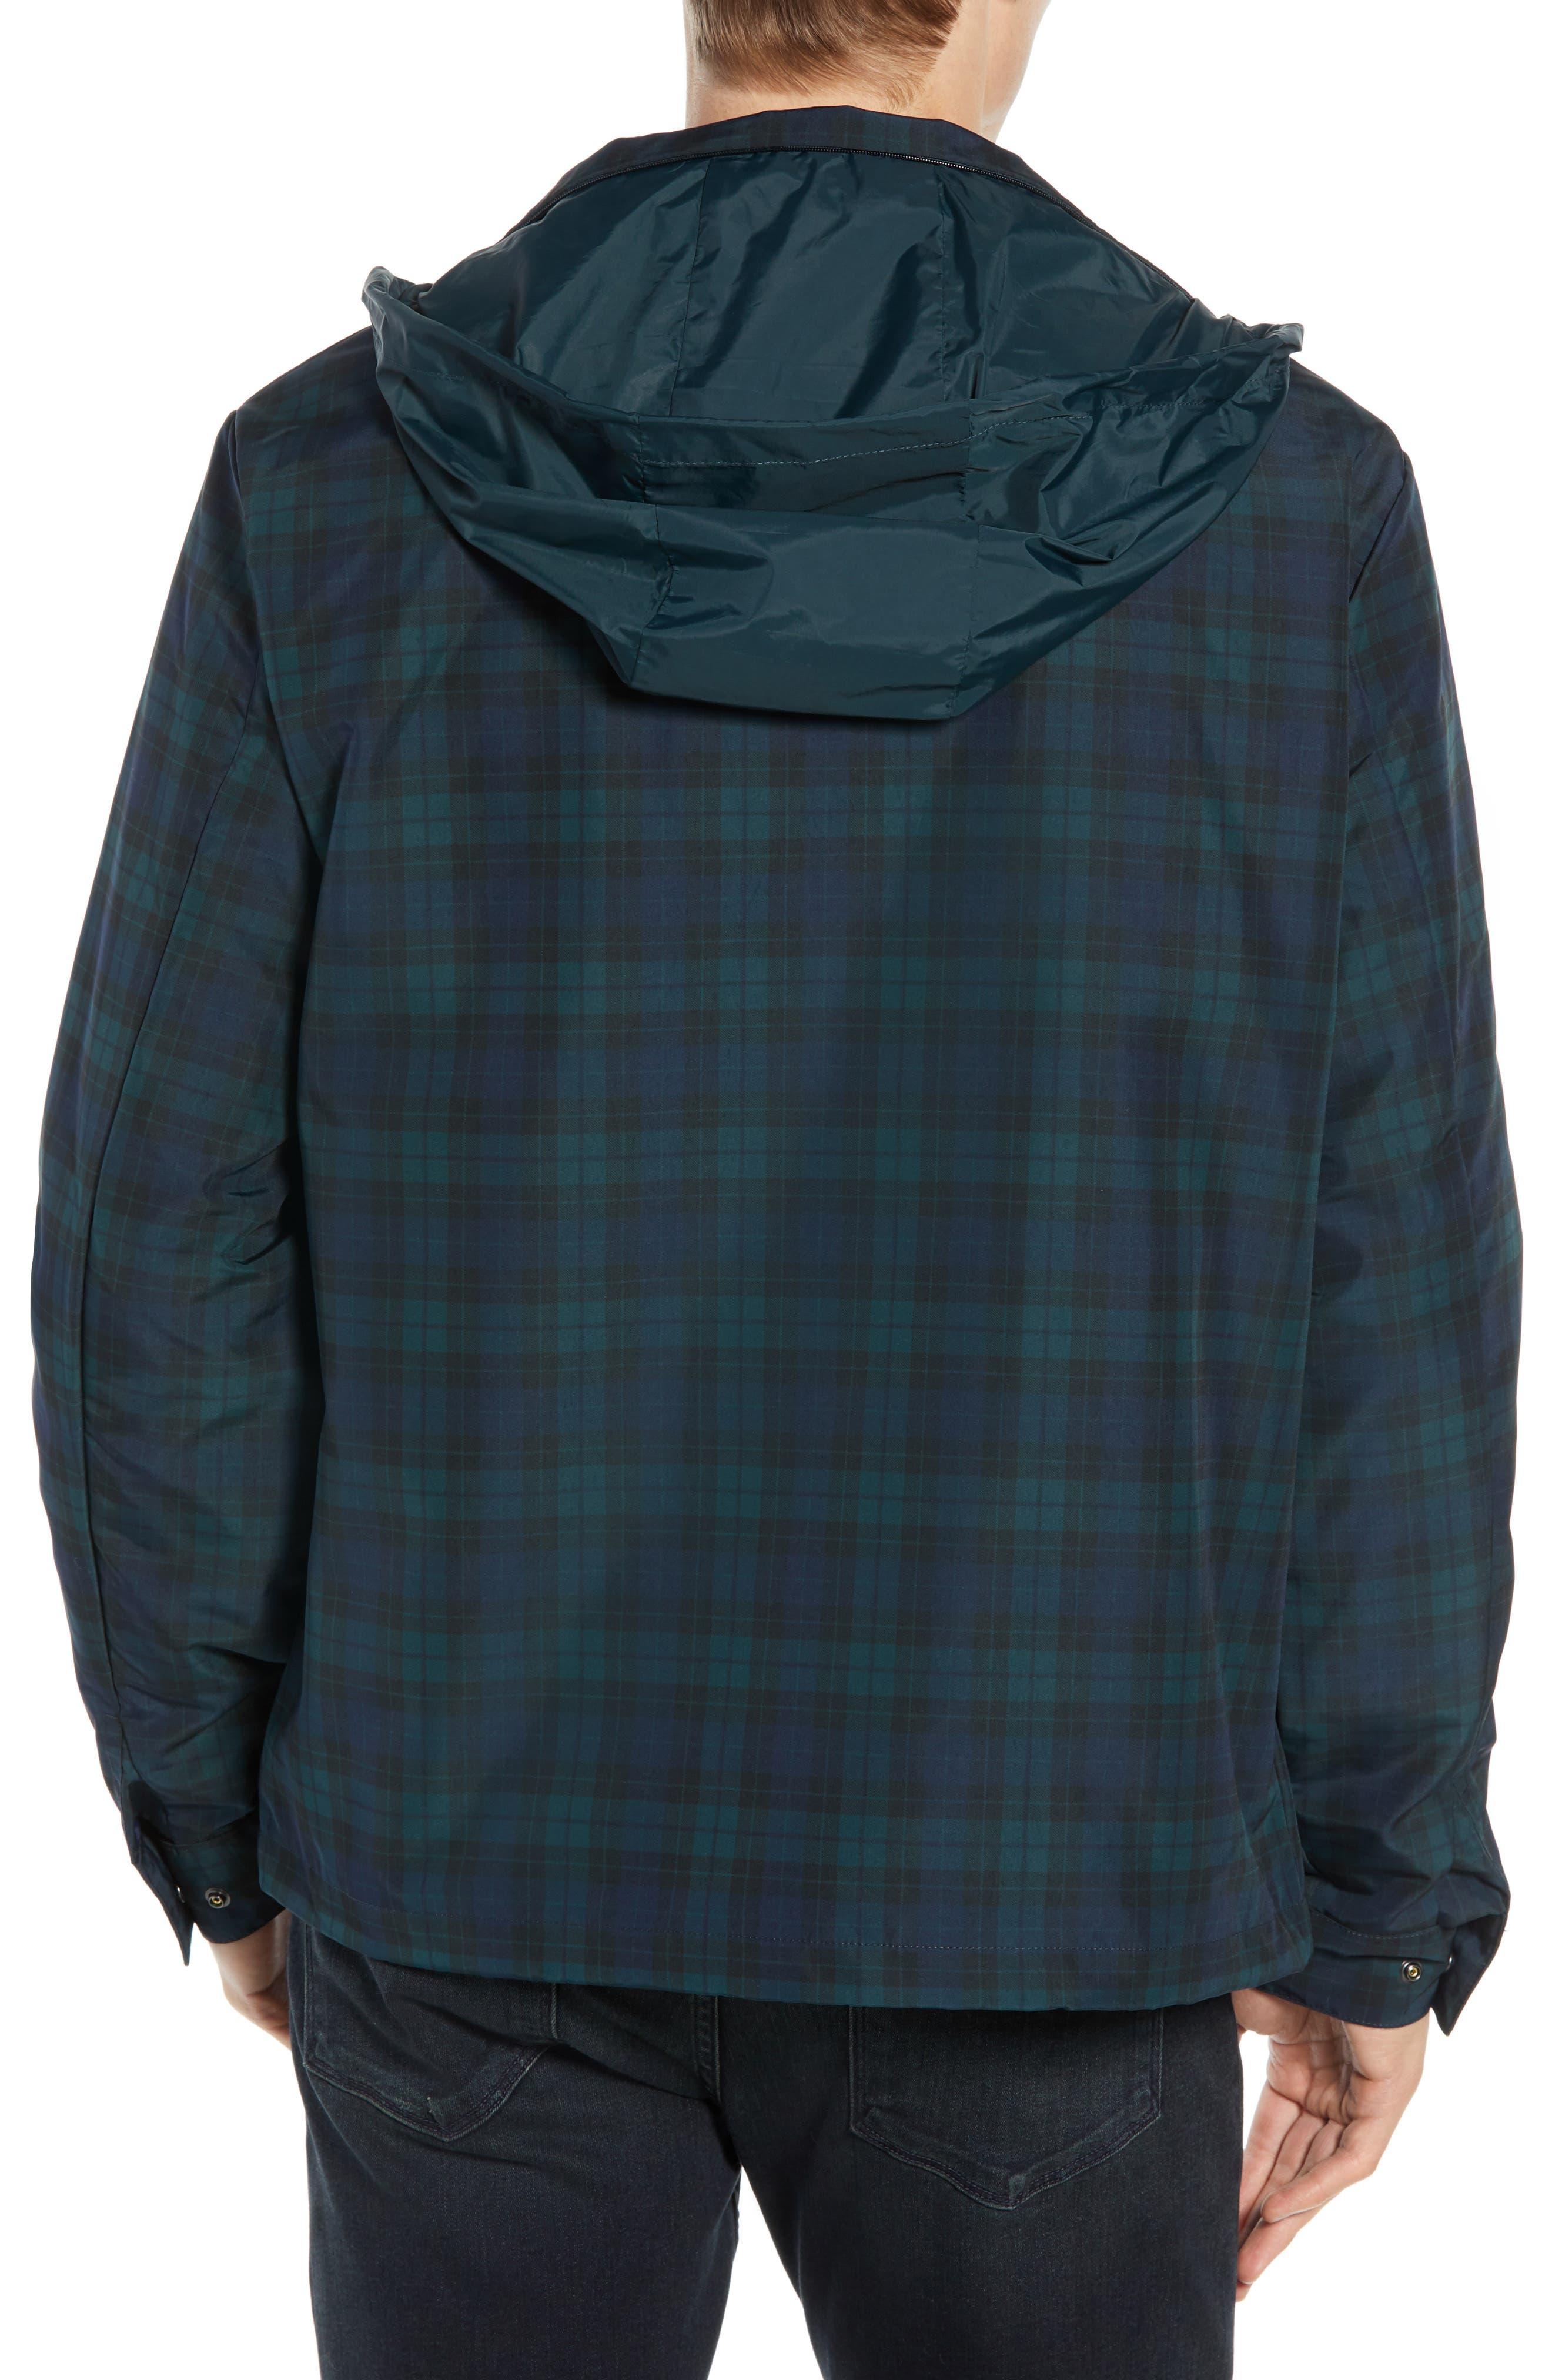 Regular Fit Check Windbreaker Jacket,                             Alternate thumbnail 2, color,                             NAVY BLUE/ SINOPLE BLACK